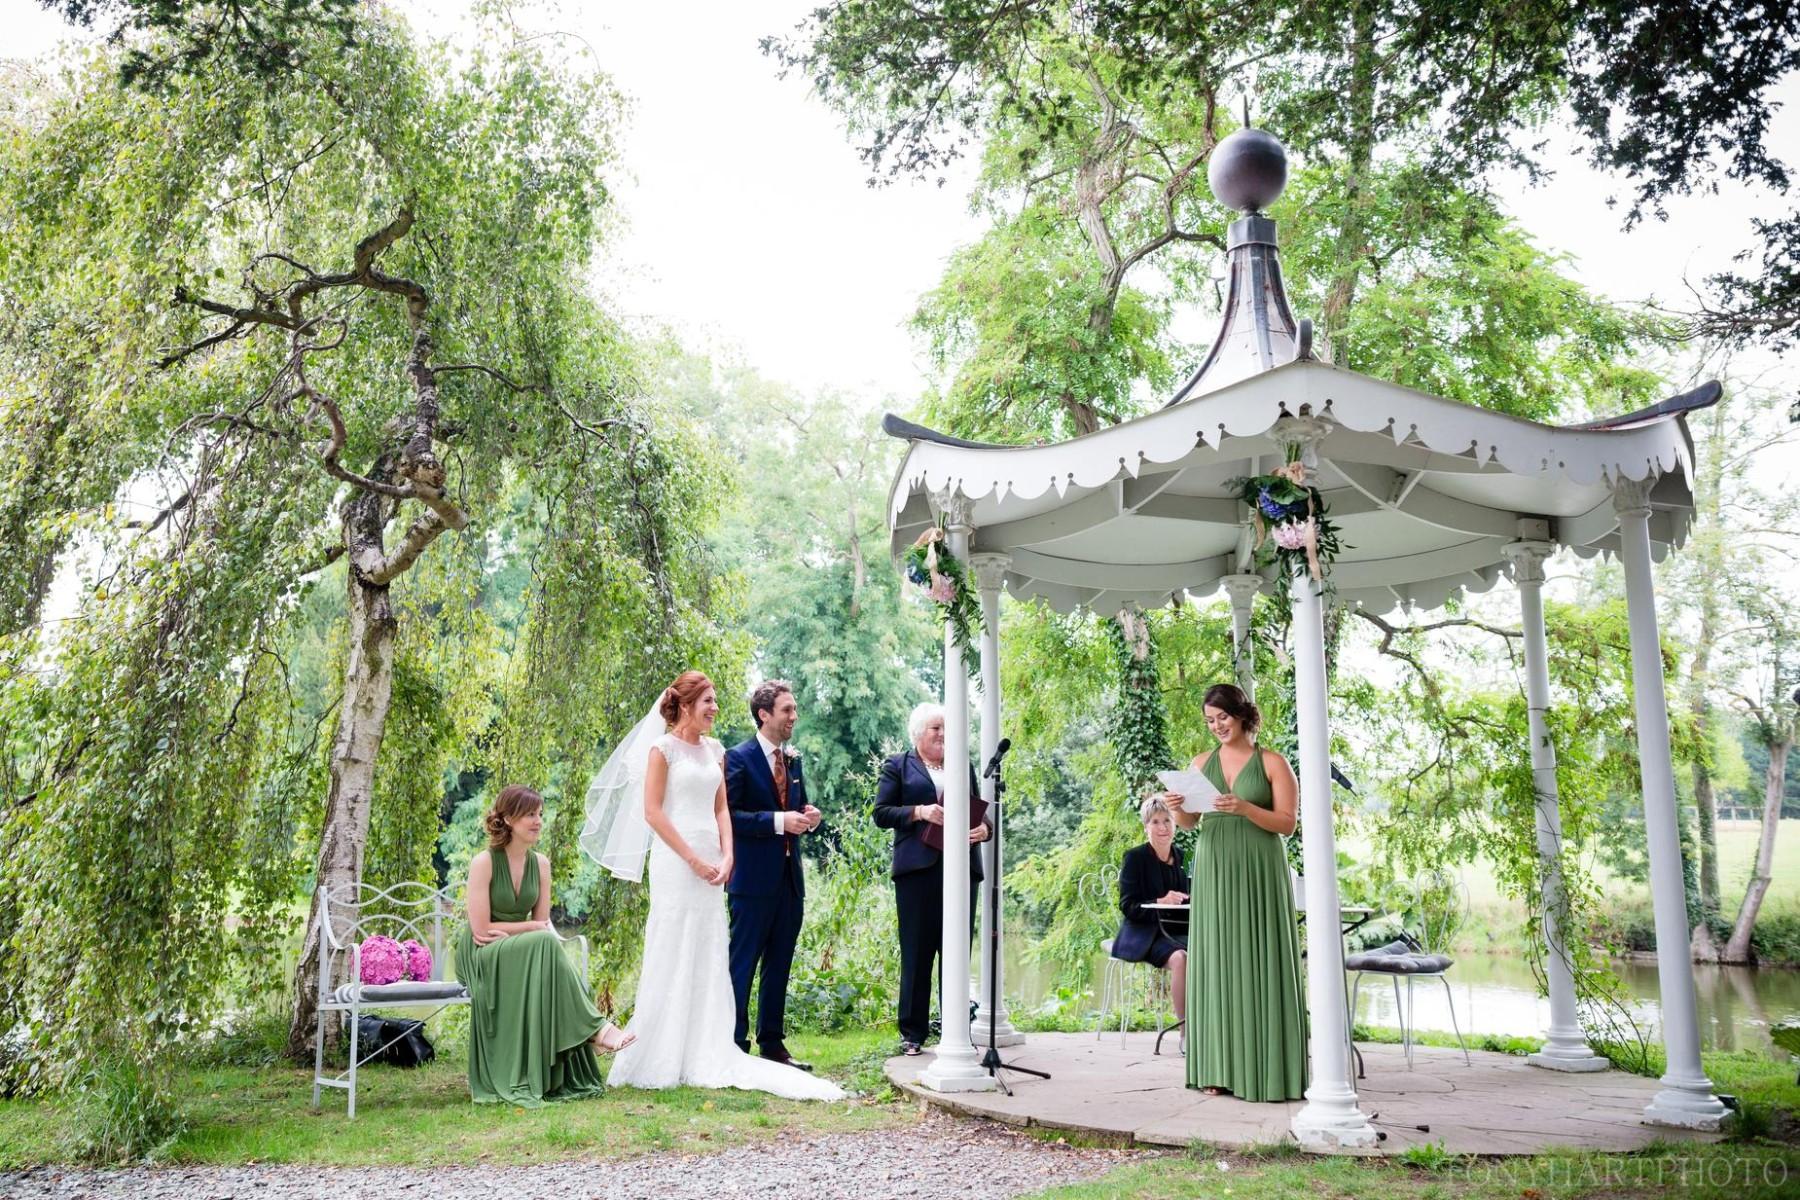 preston_court_wedding_photography_ad-053-900x600@2x